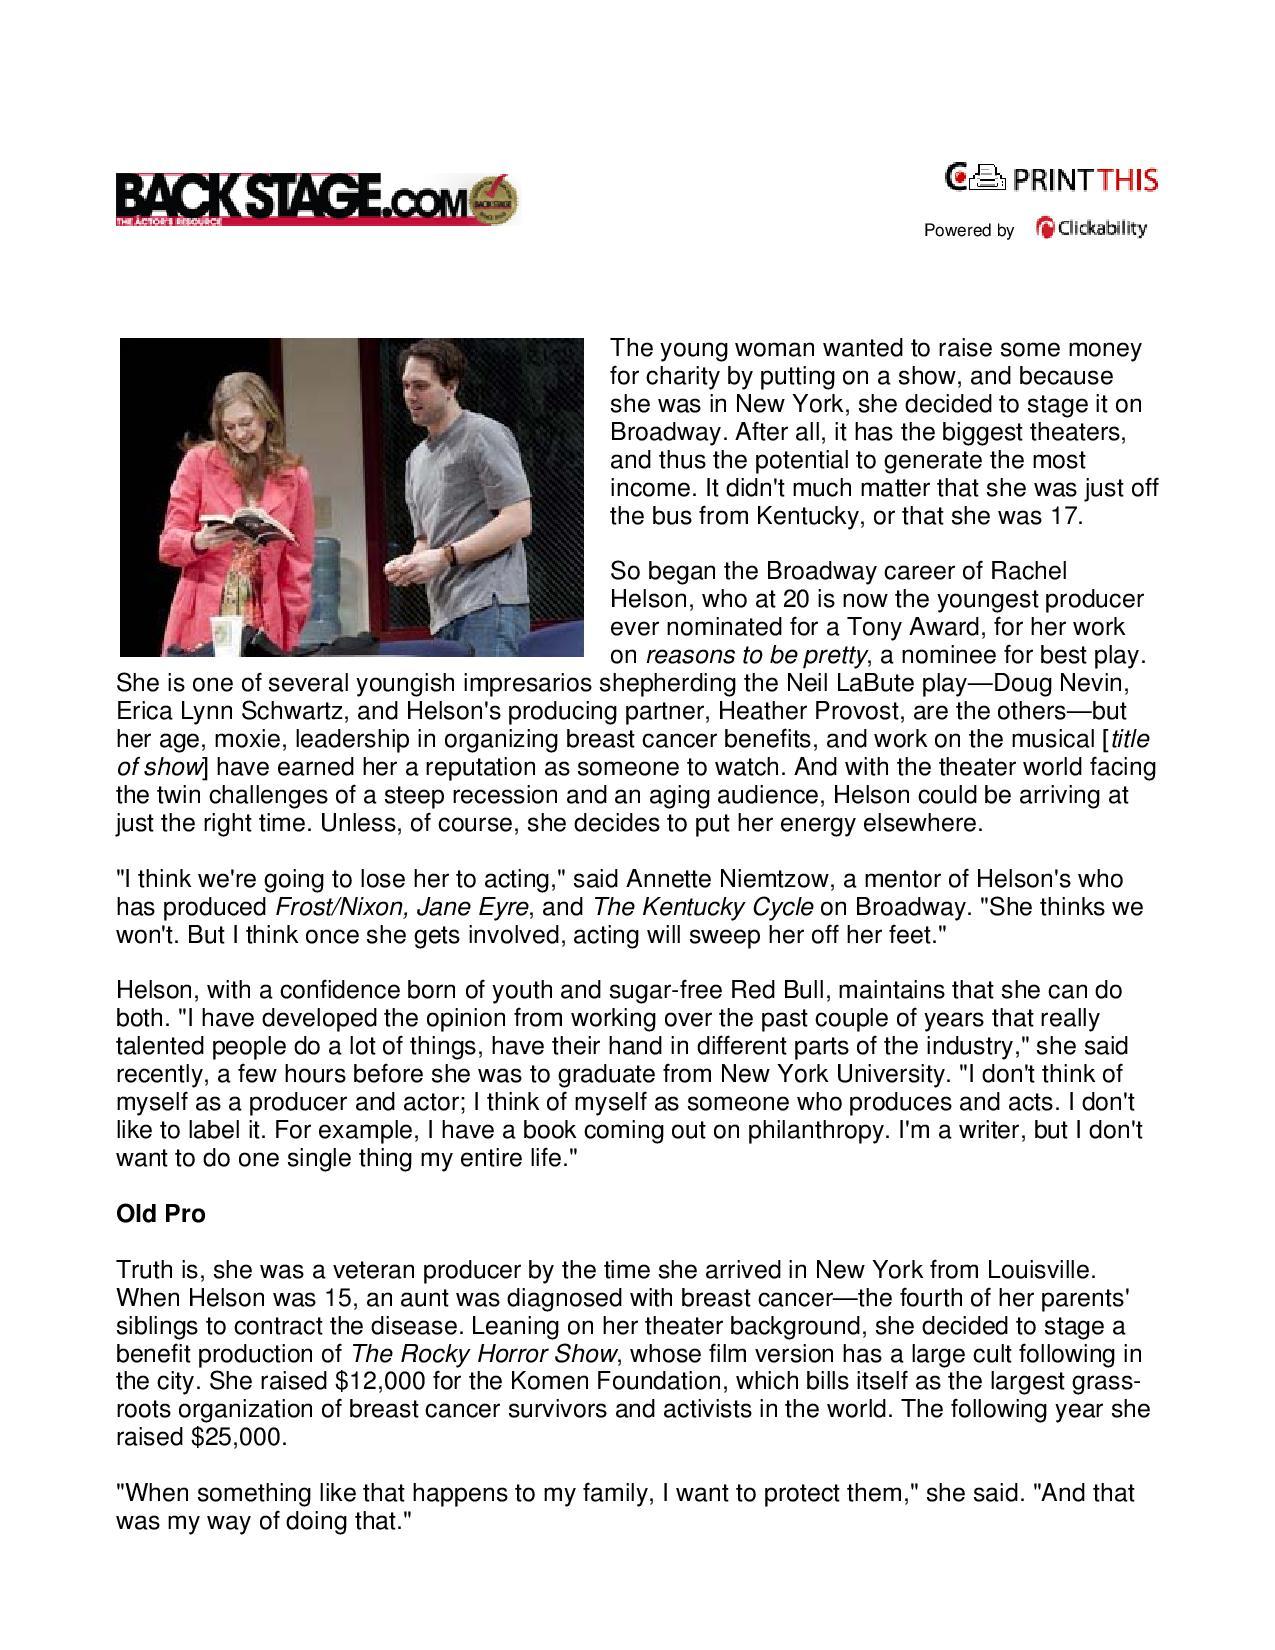 Backstage Online 5-27-09-page-001.jpg